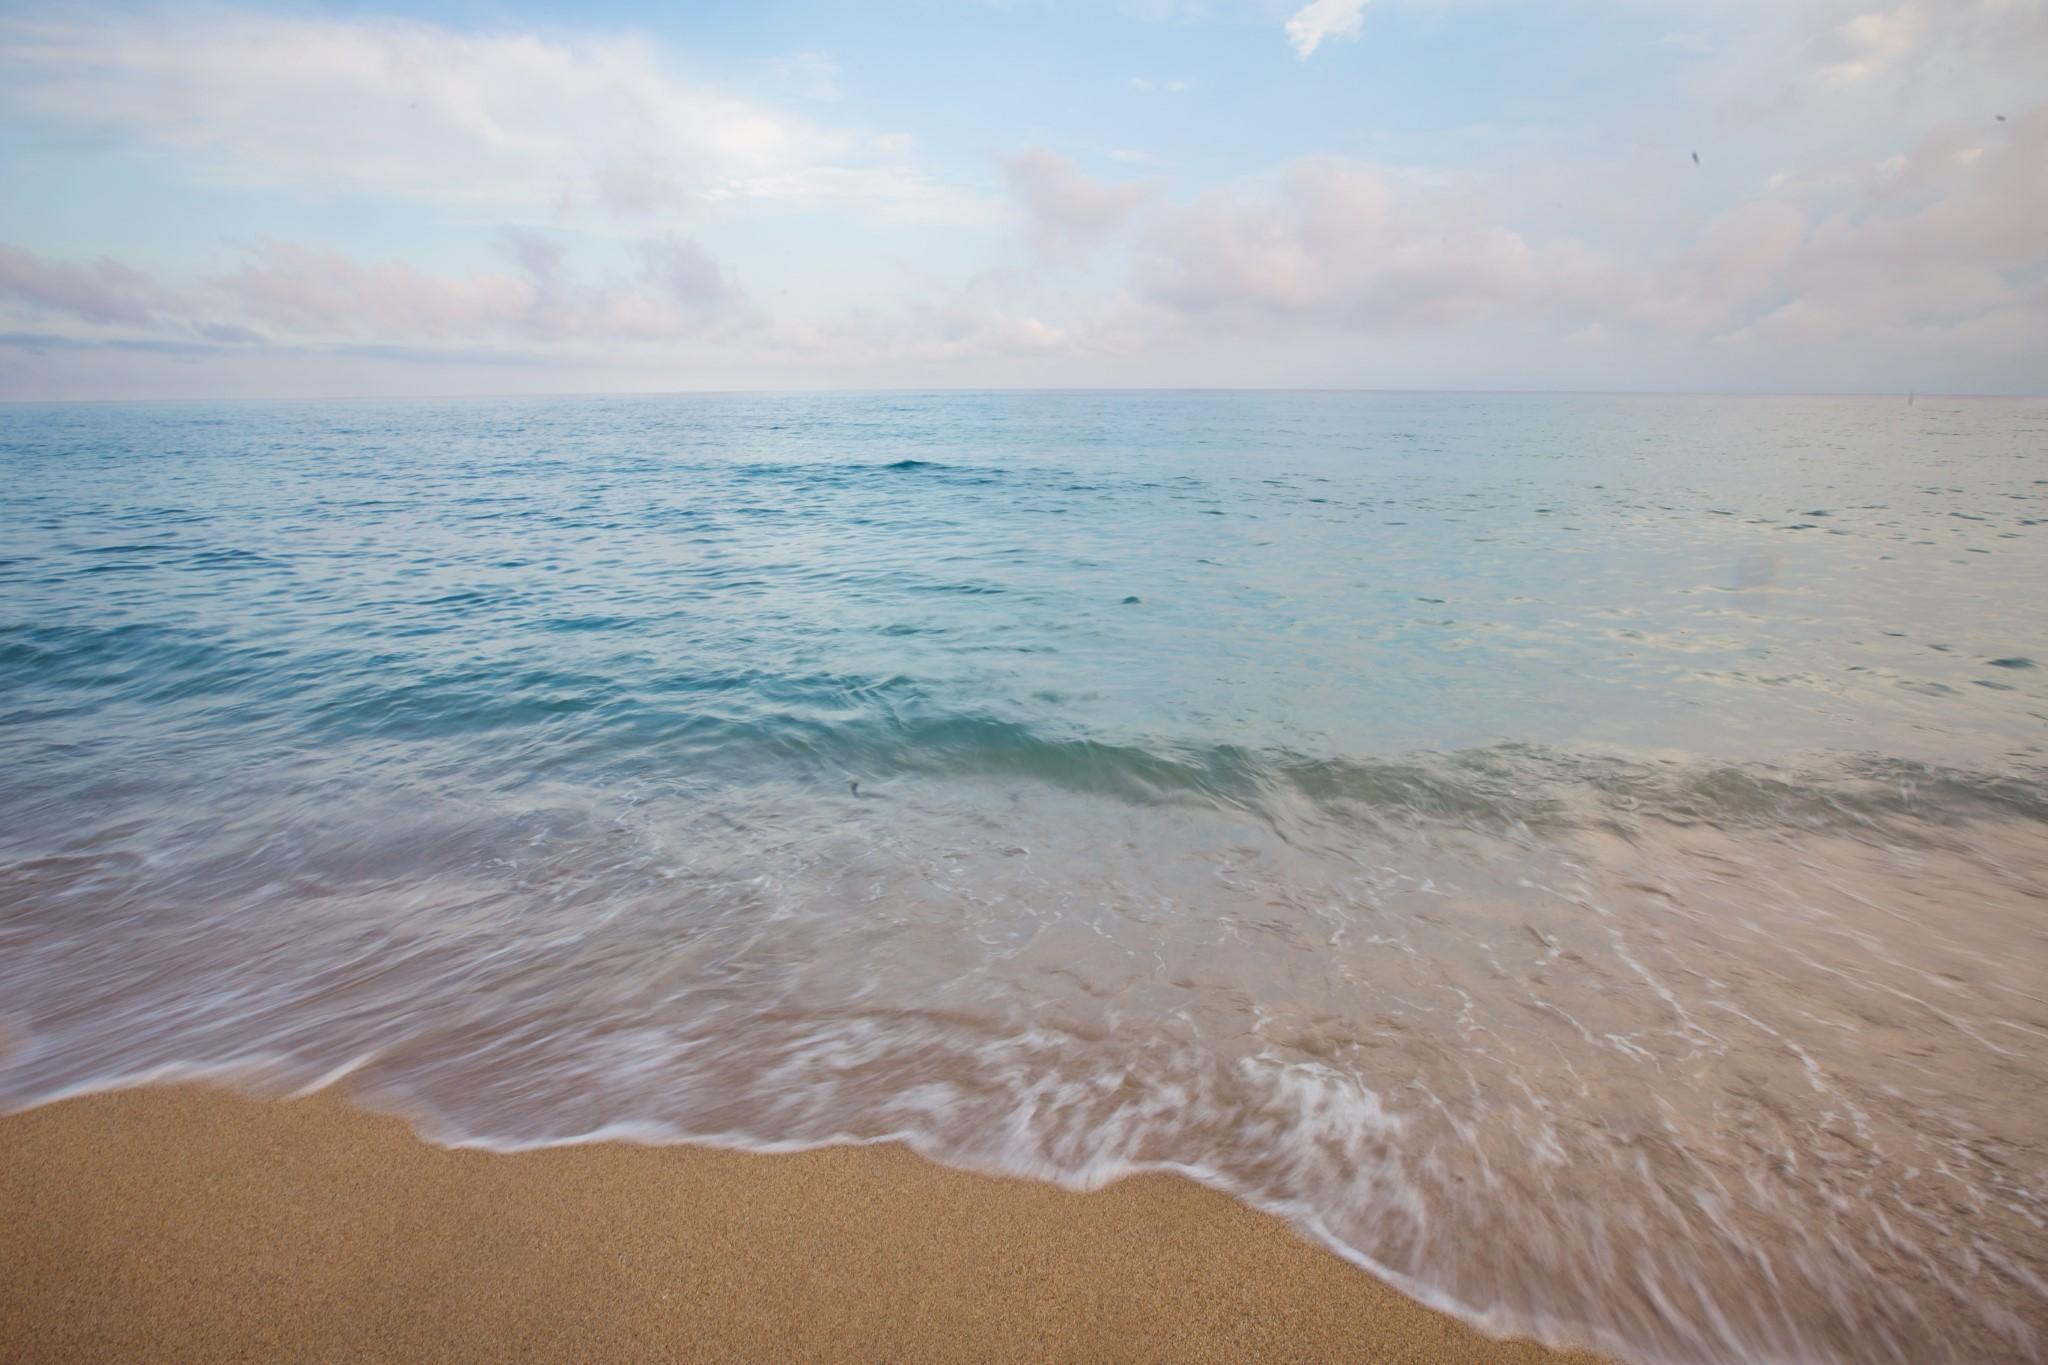 Beach in Orosei, Sardinia, Italy